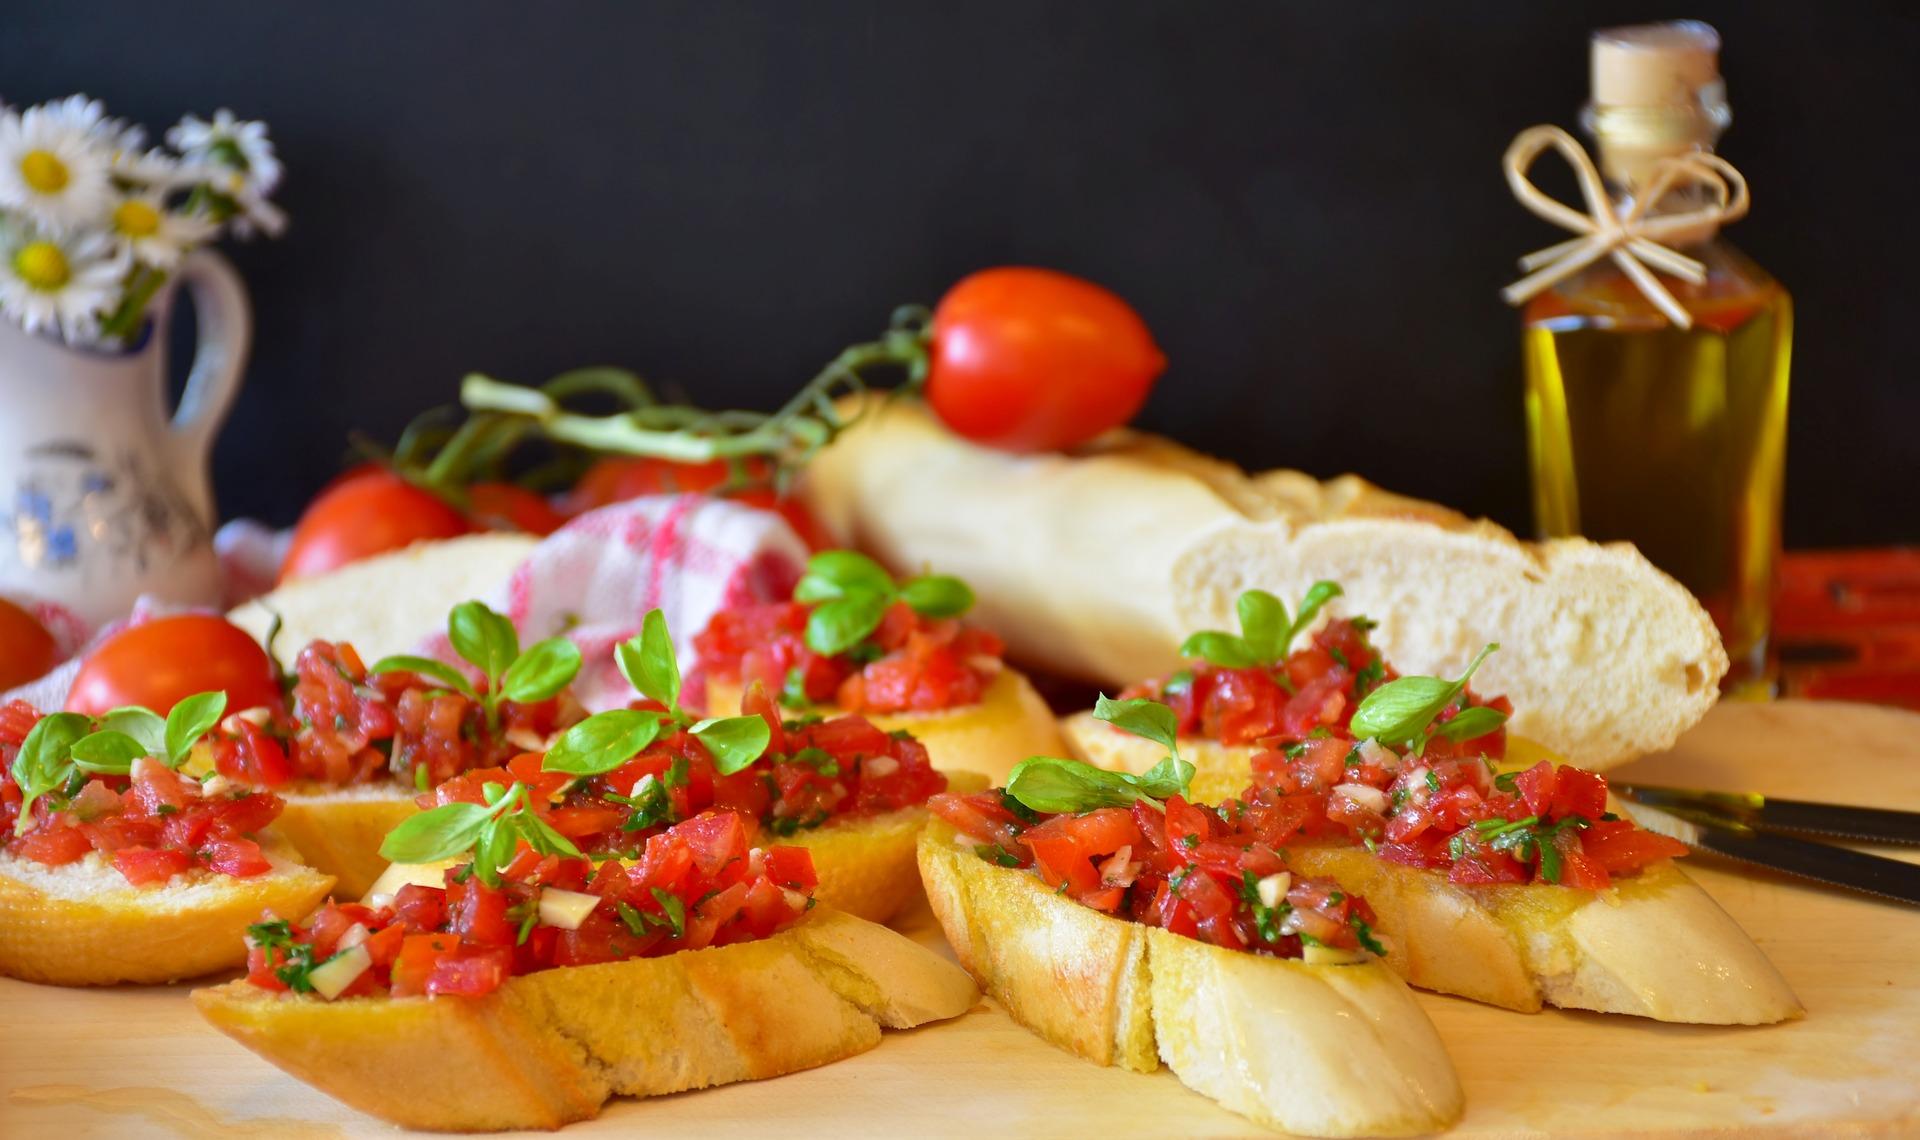 Bruschettes de la comida italiana